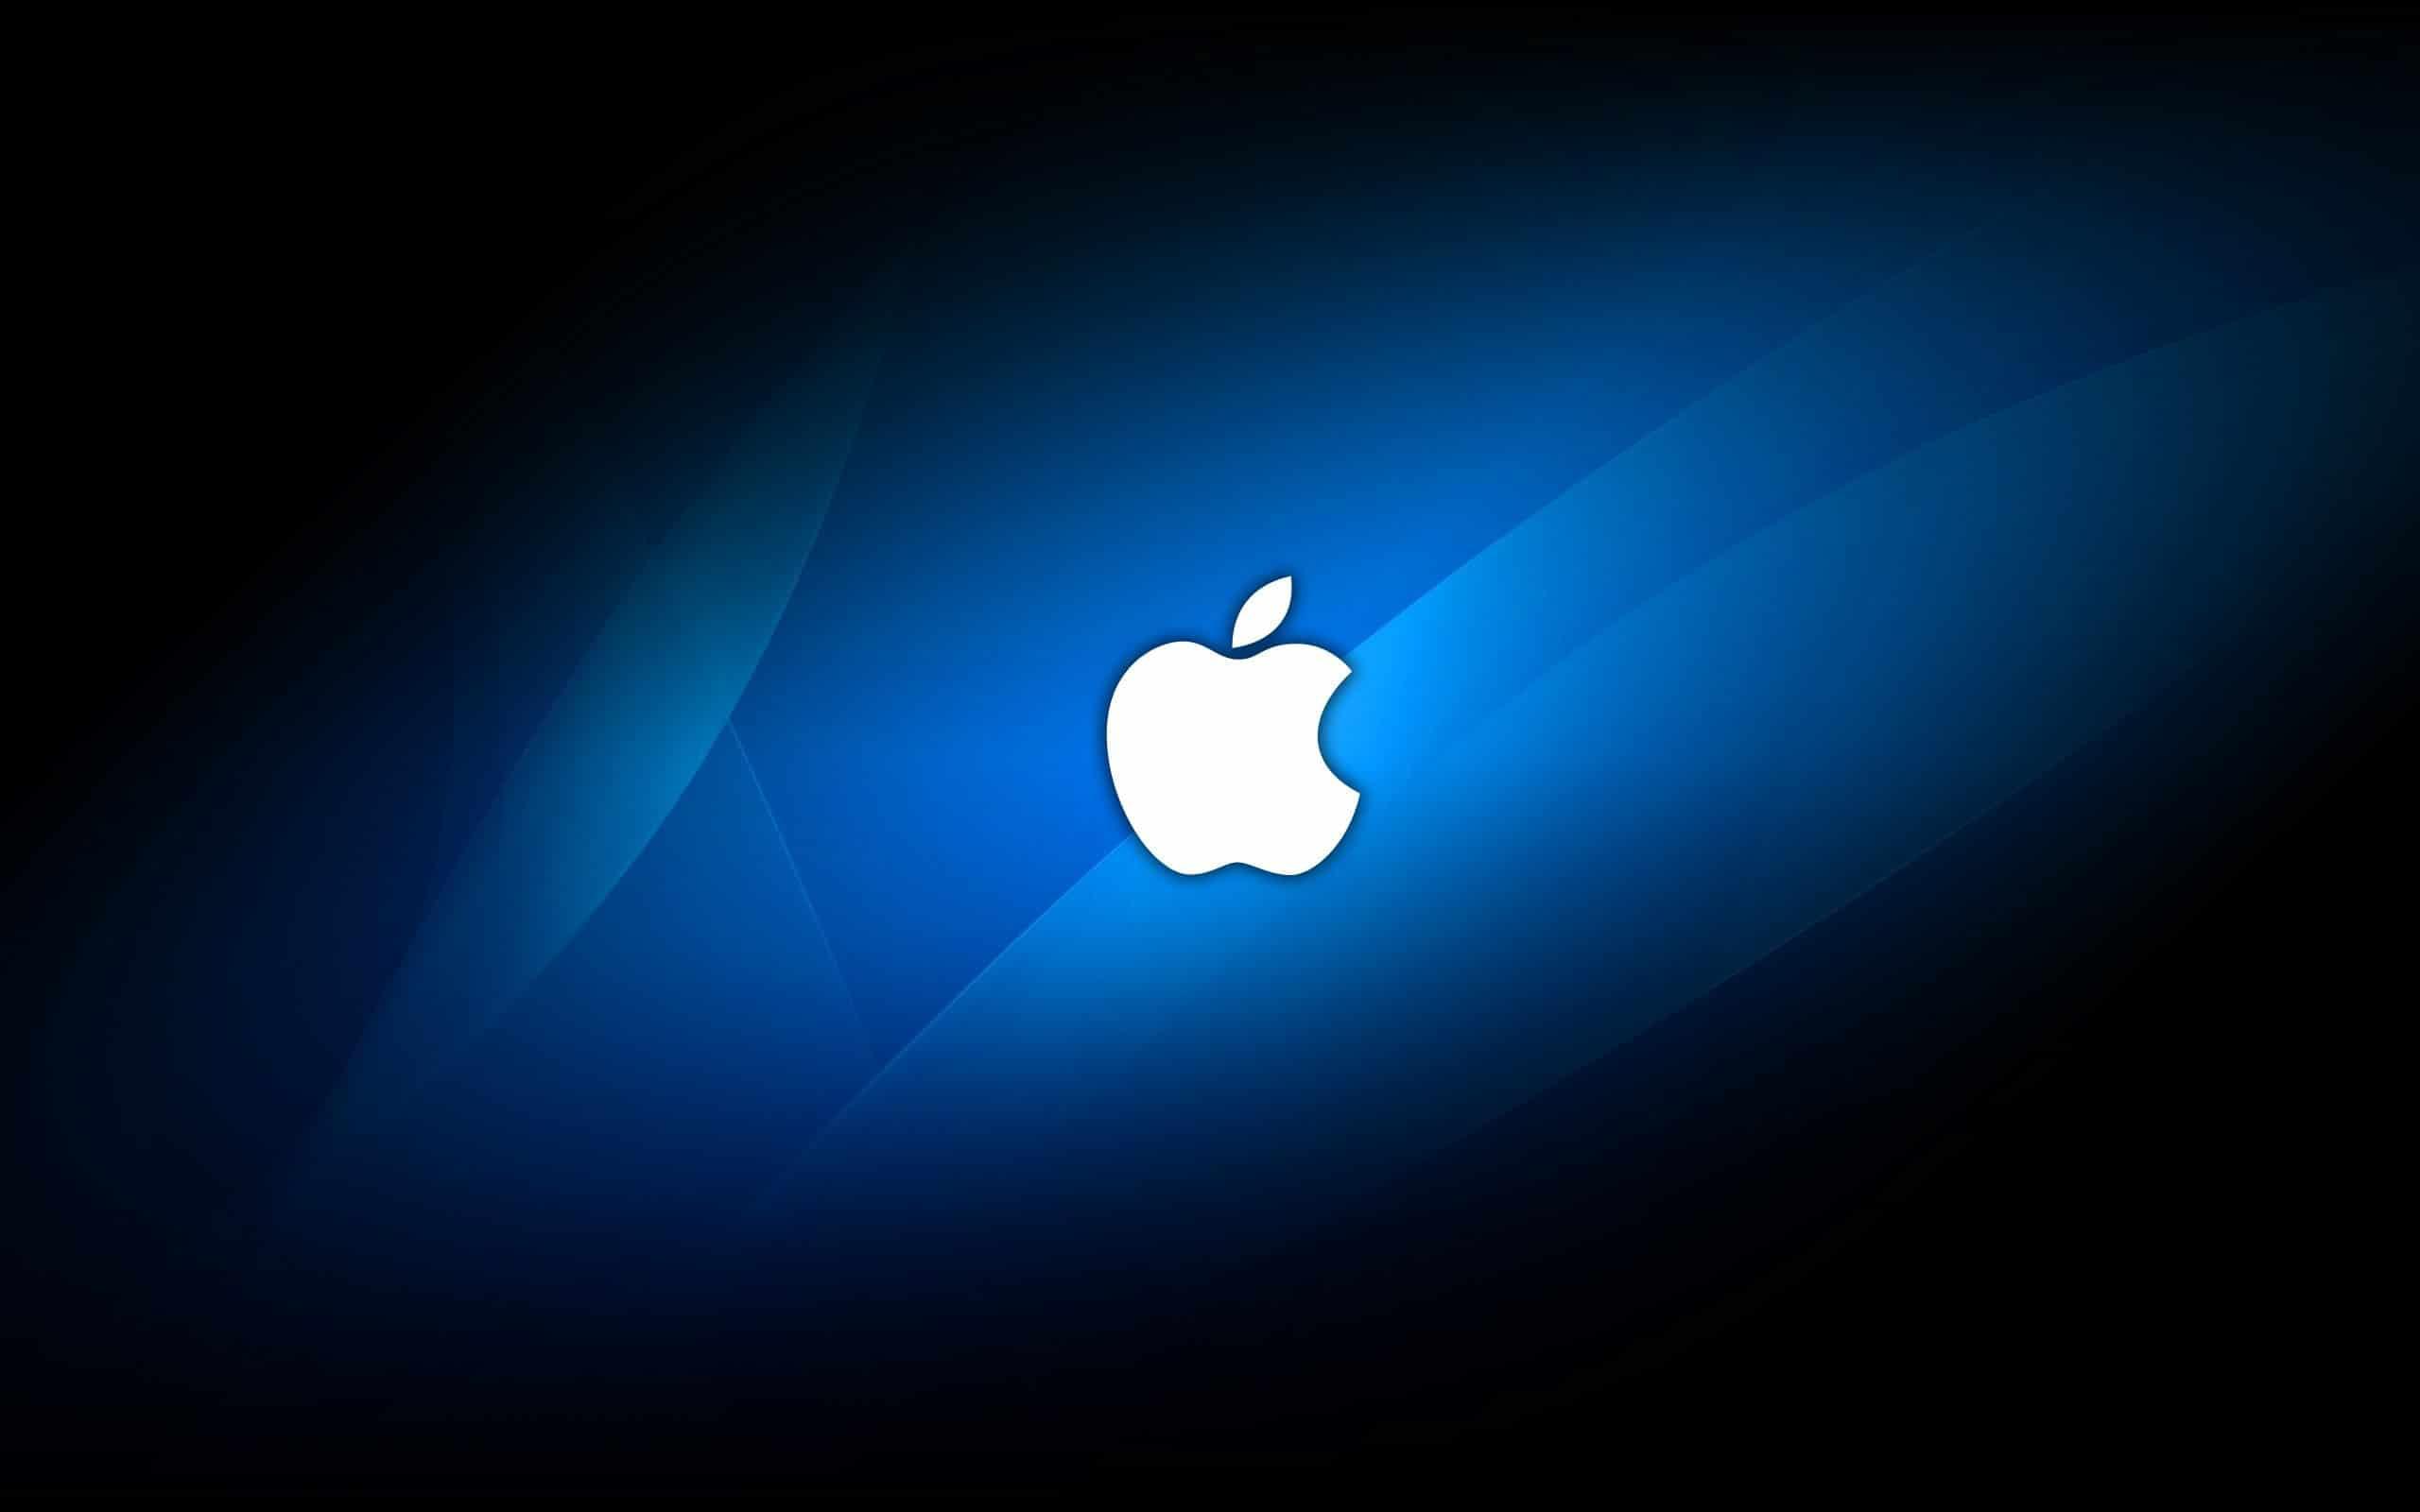 apple_3-27335